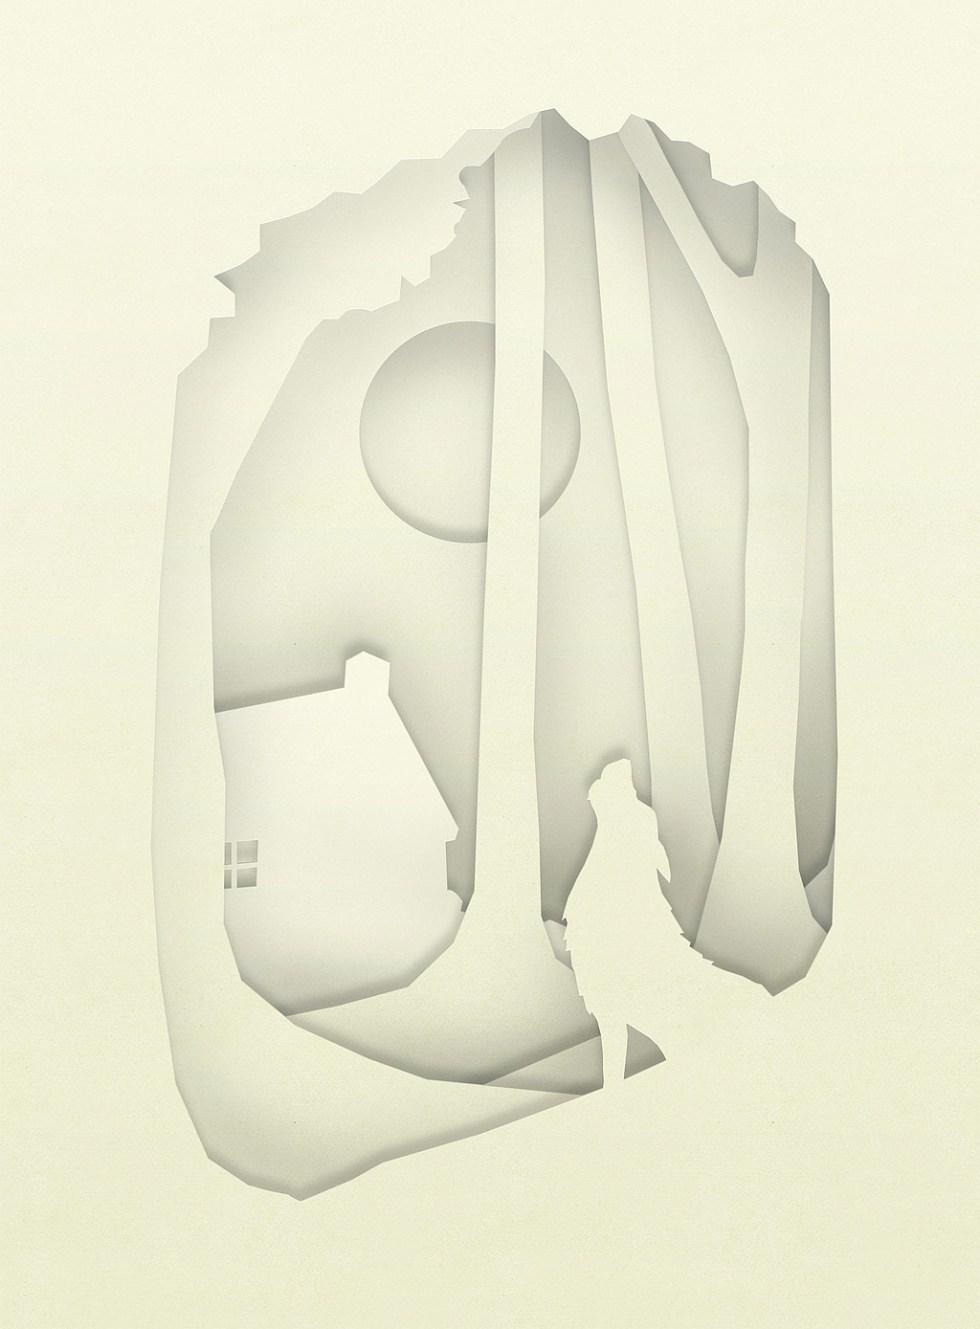 Wolfwood papercut card design